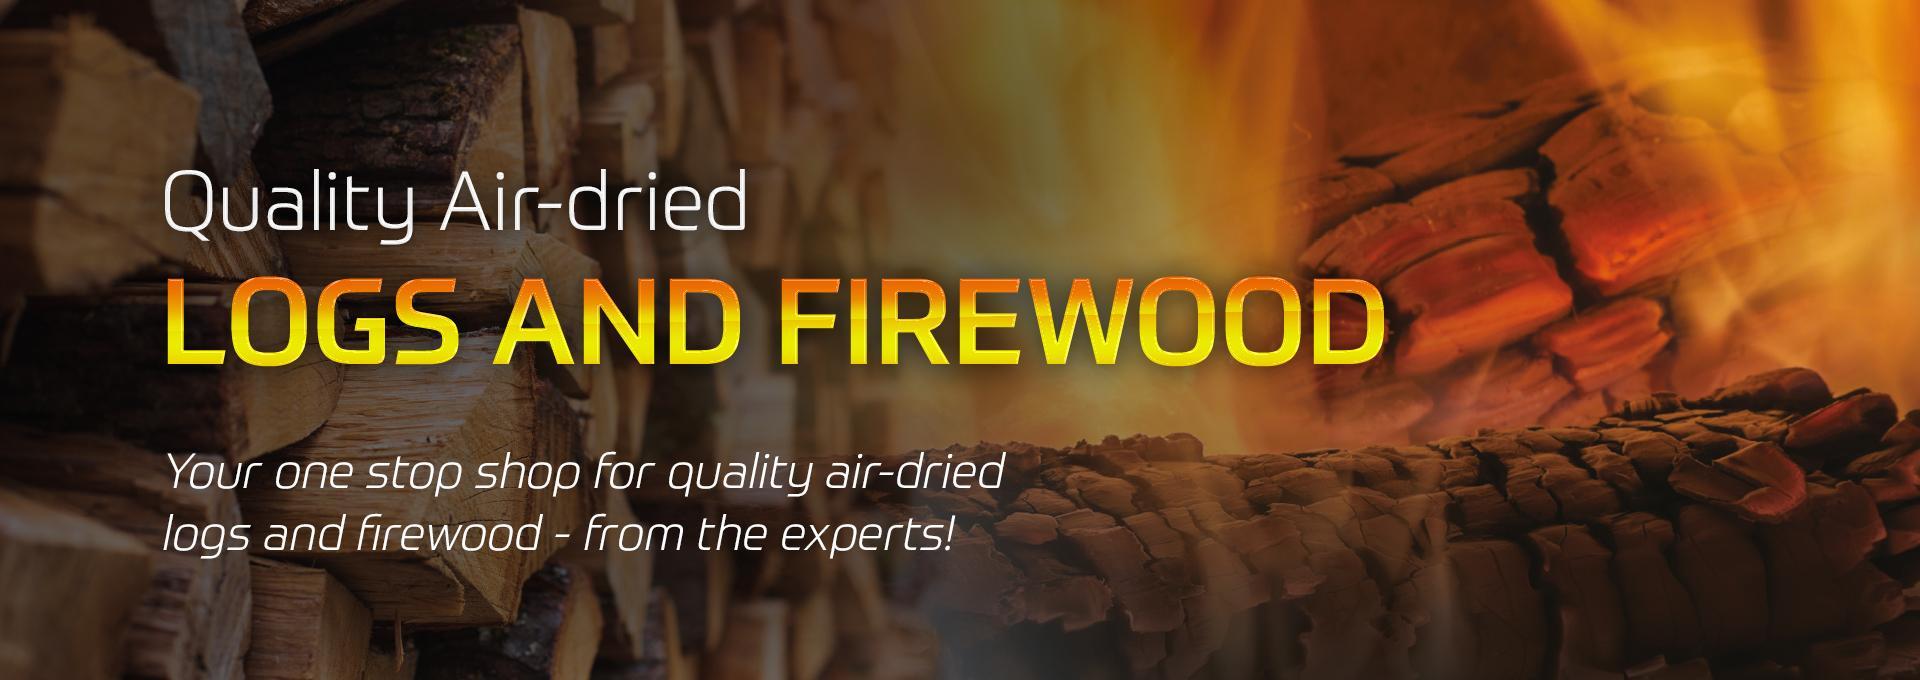 EFC Firewood Web Banner